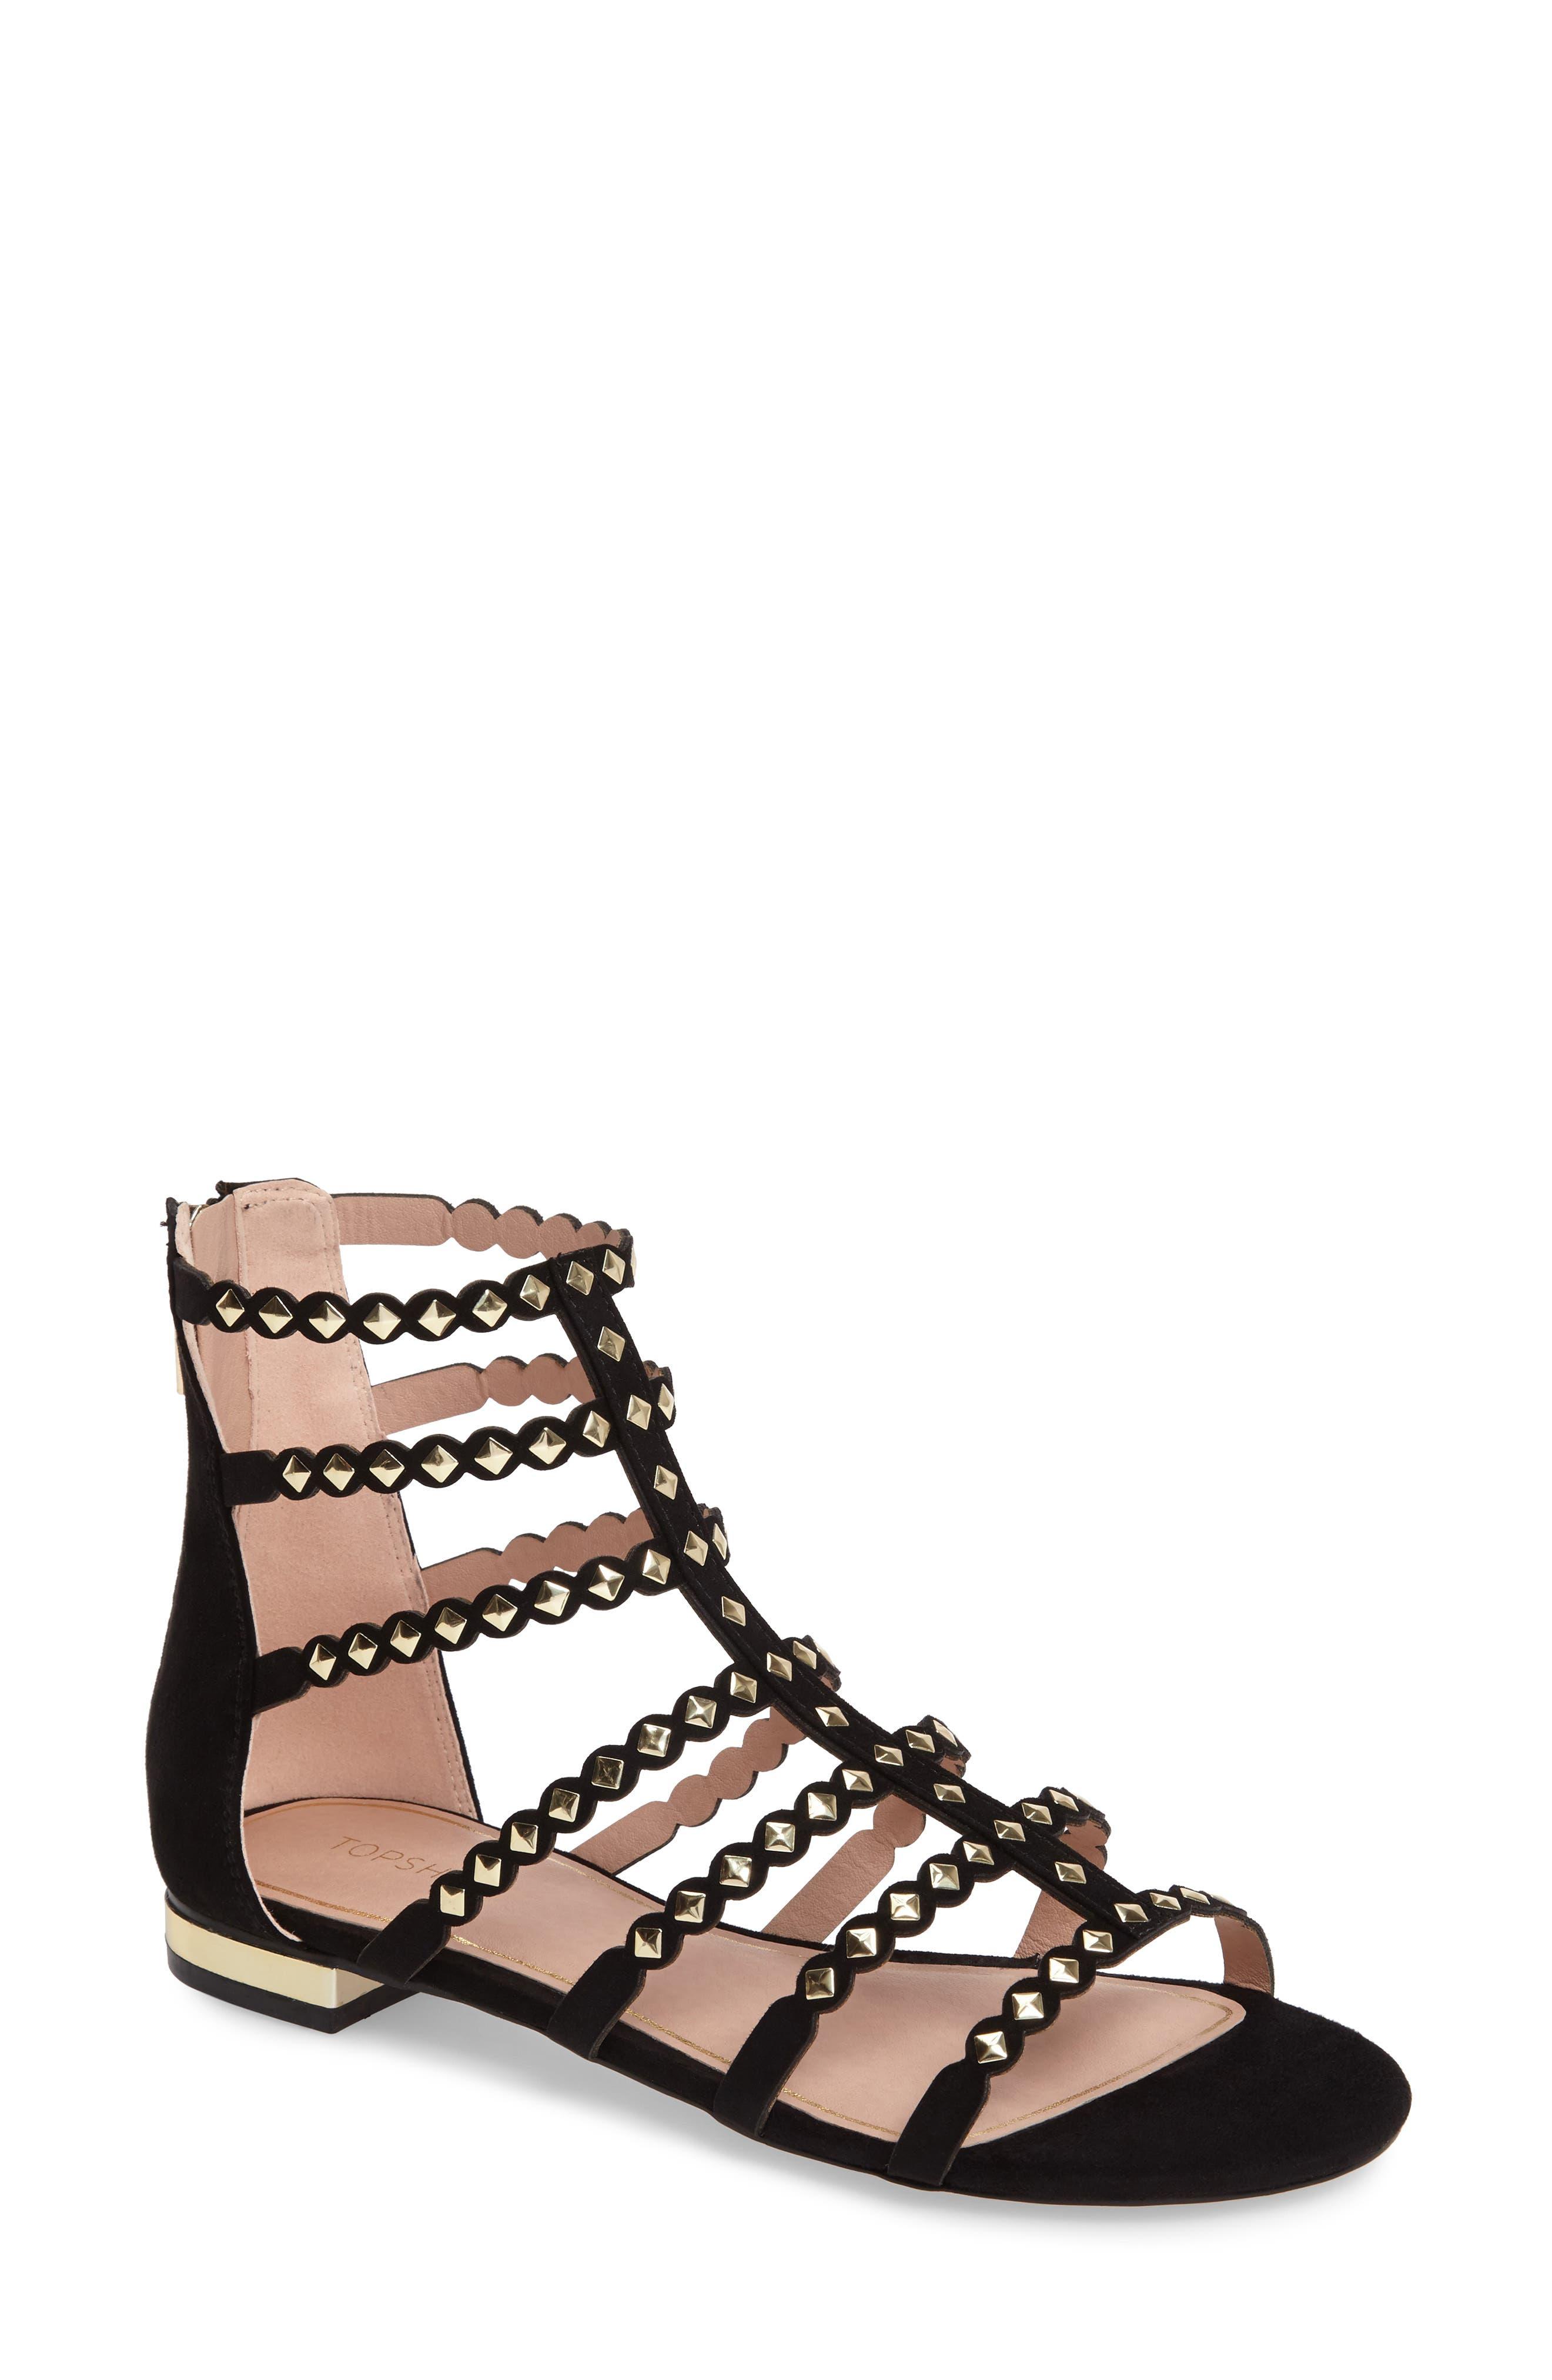 Main Image - Topshop Higher Stud Gladiator Sandal (Women)